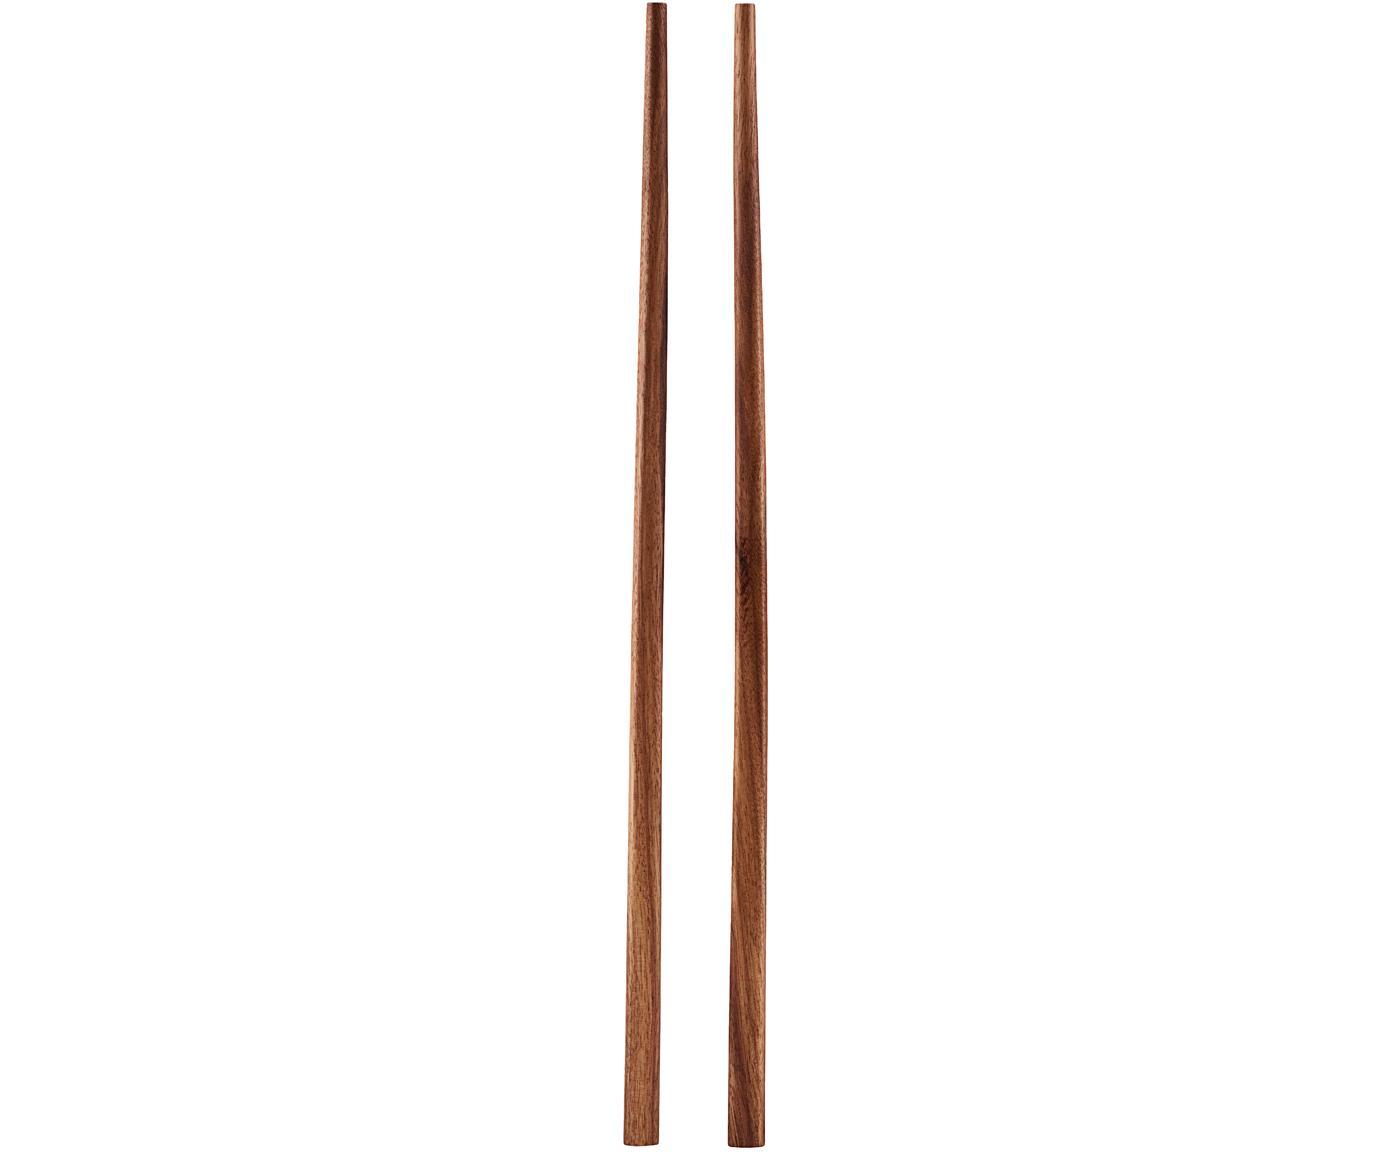 Essstäbchen Asia aus Palawanholz, 3 Paar, Palawanholz, Palawanholz, L 23 cm